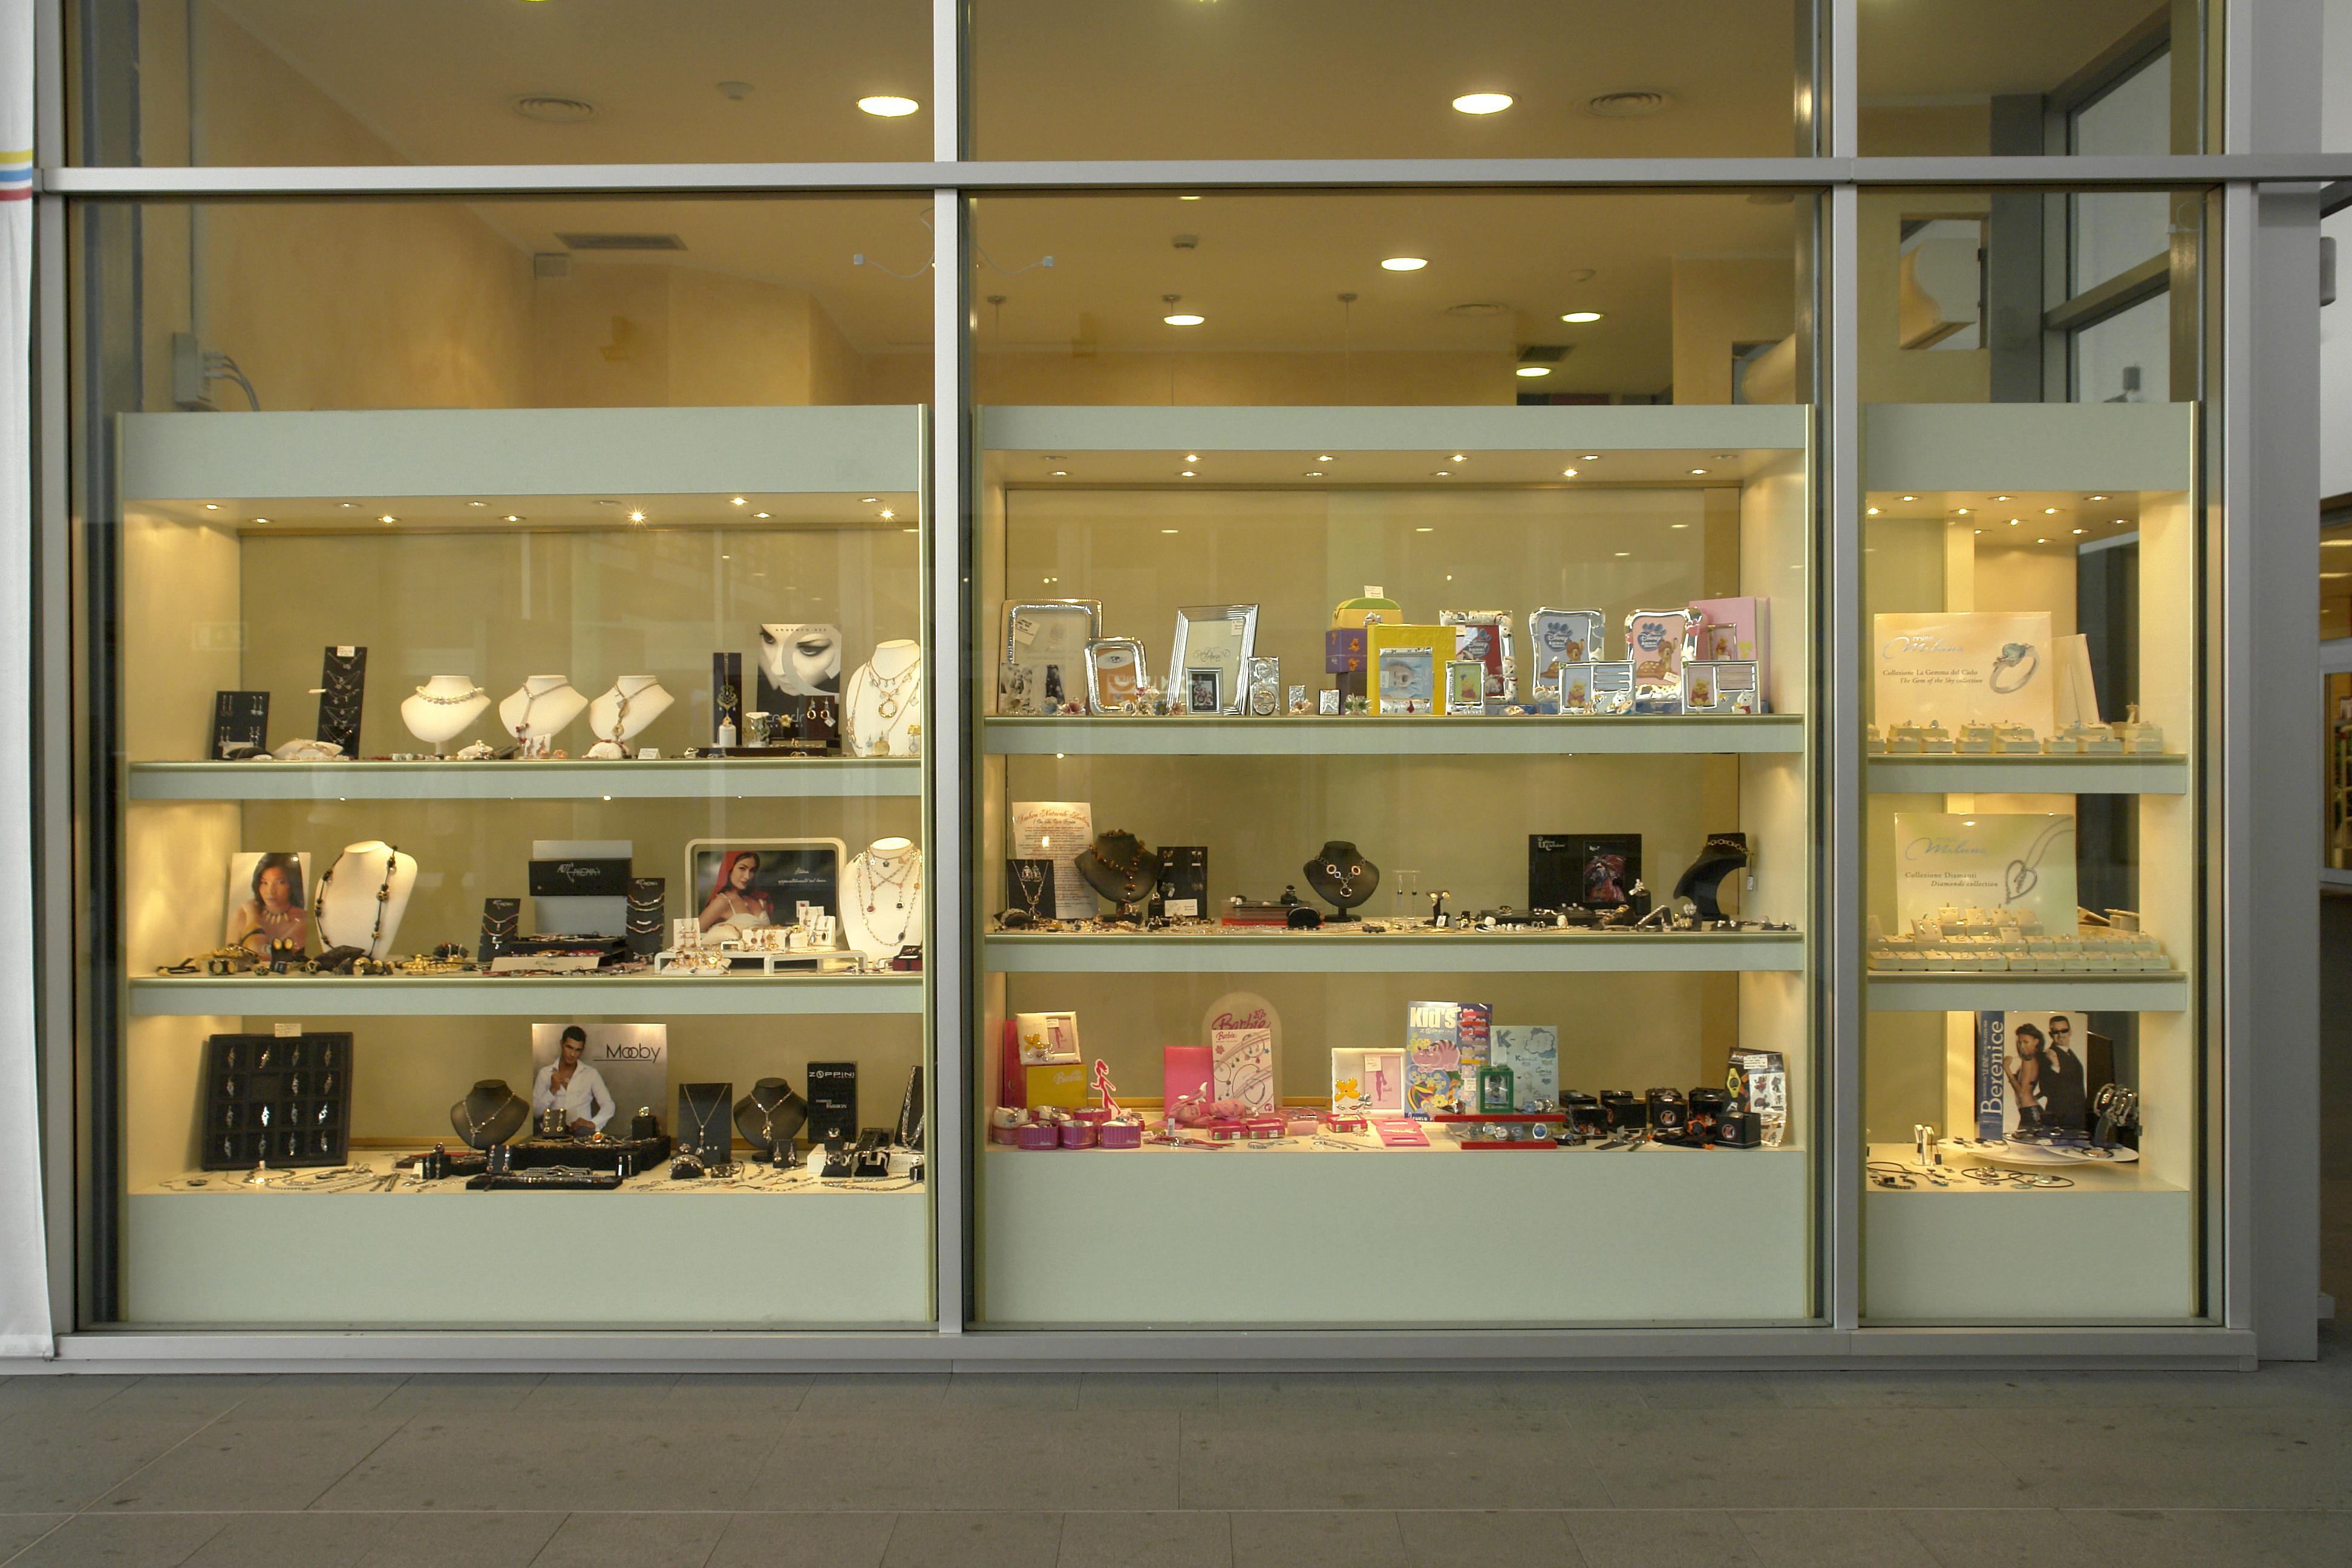 Arredamenti per gioiellerie compra in fabbrica a met for Arredamento vetrine